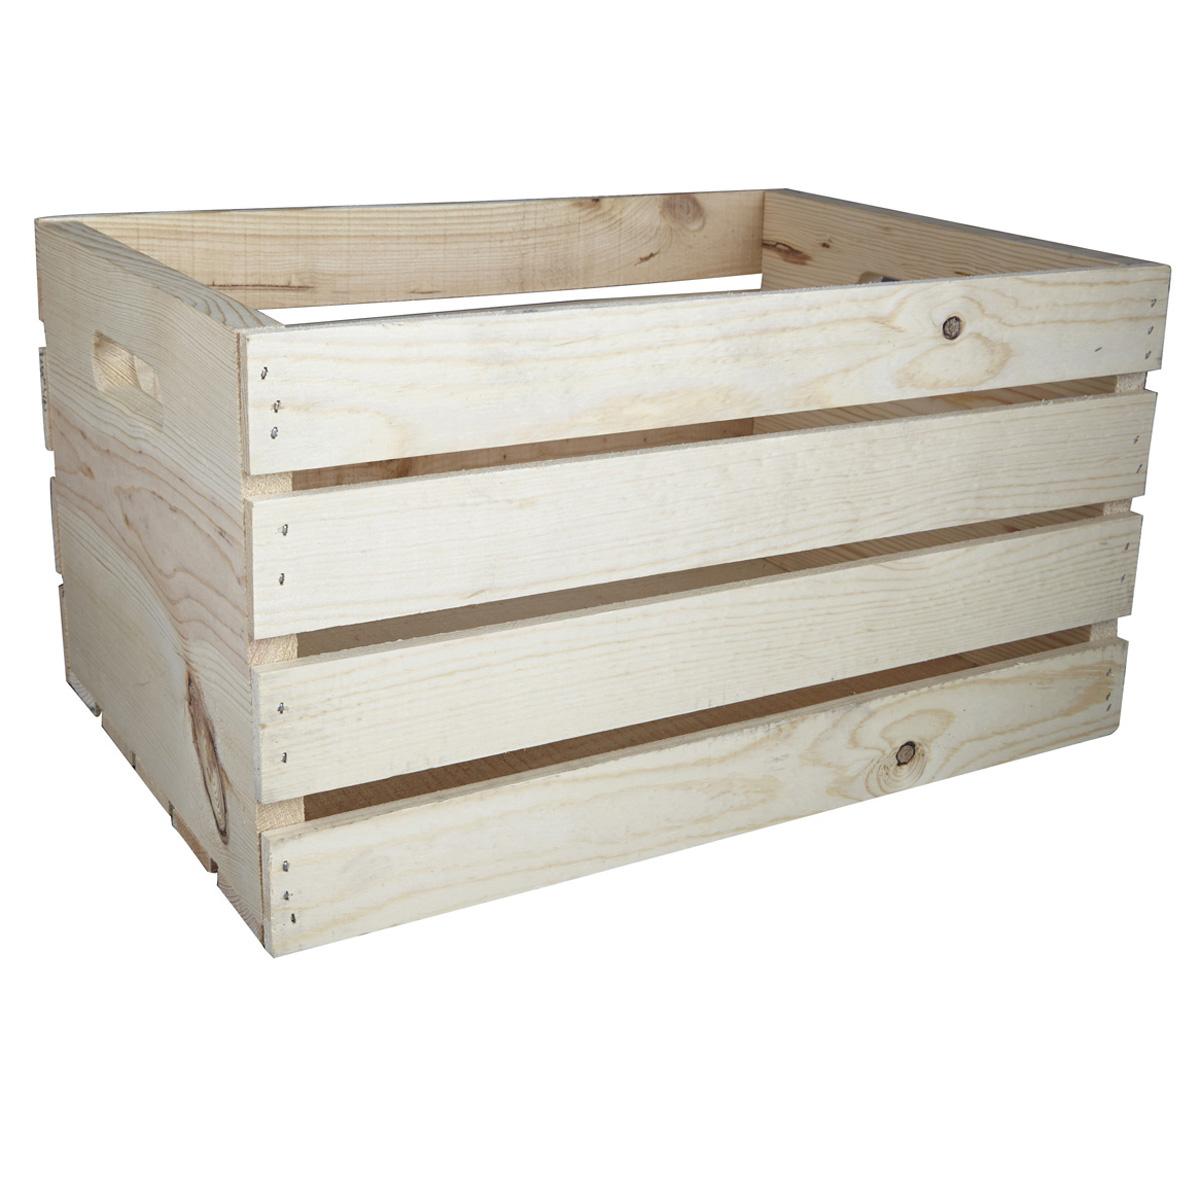 Artmindsr Wood Crate Carry All